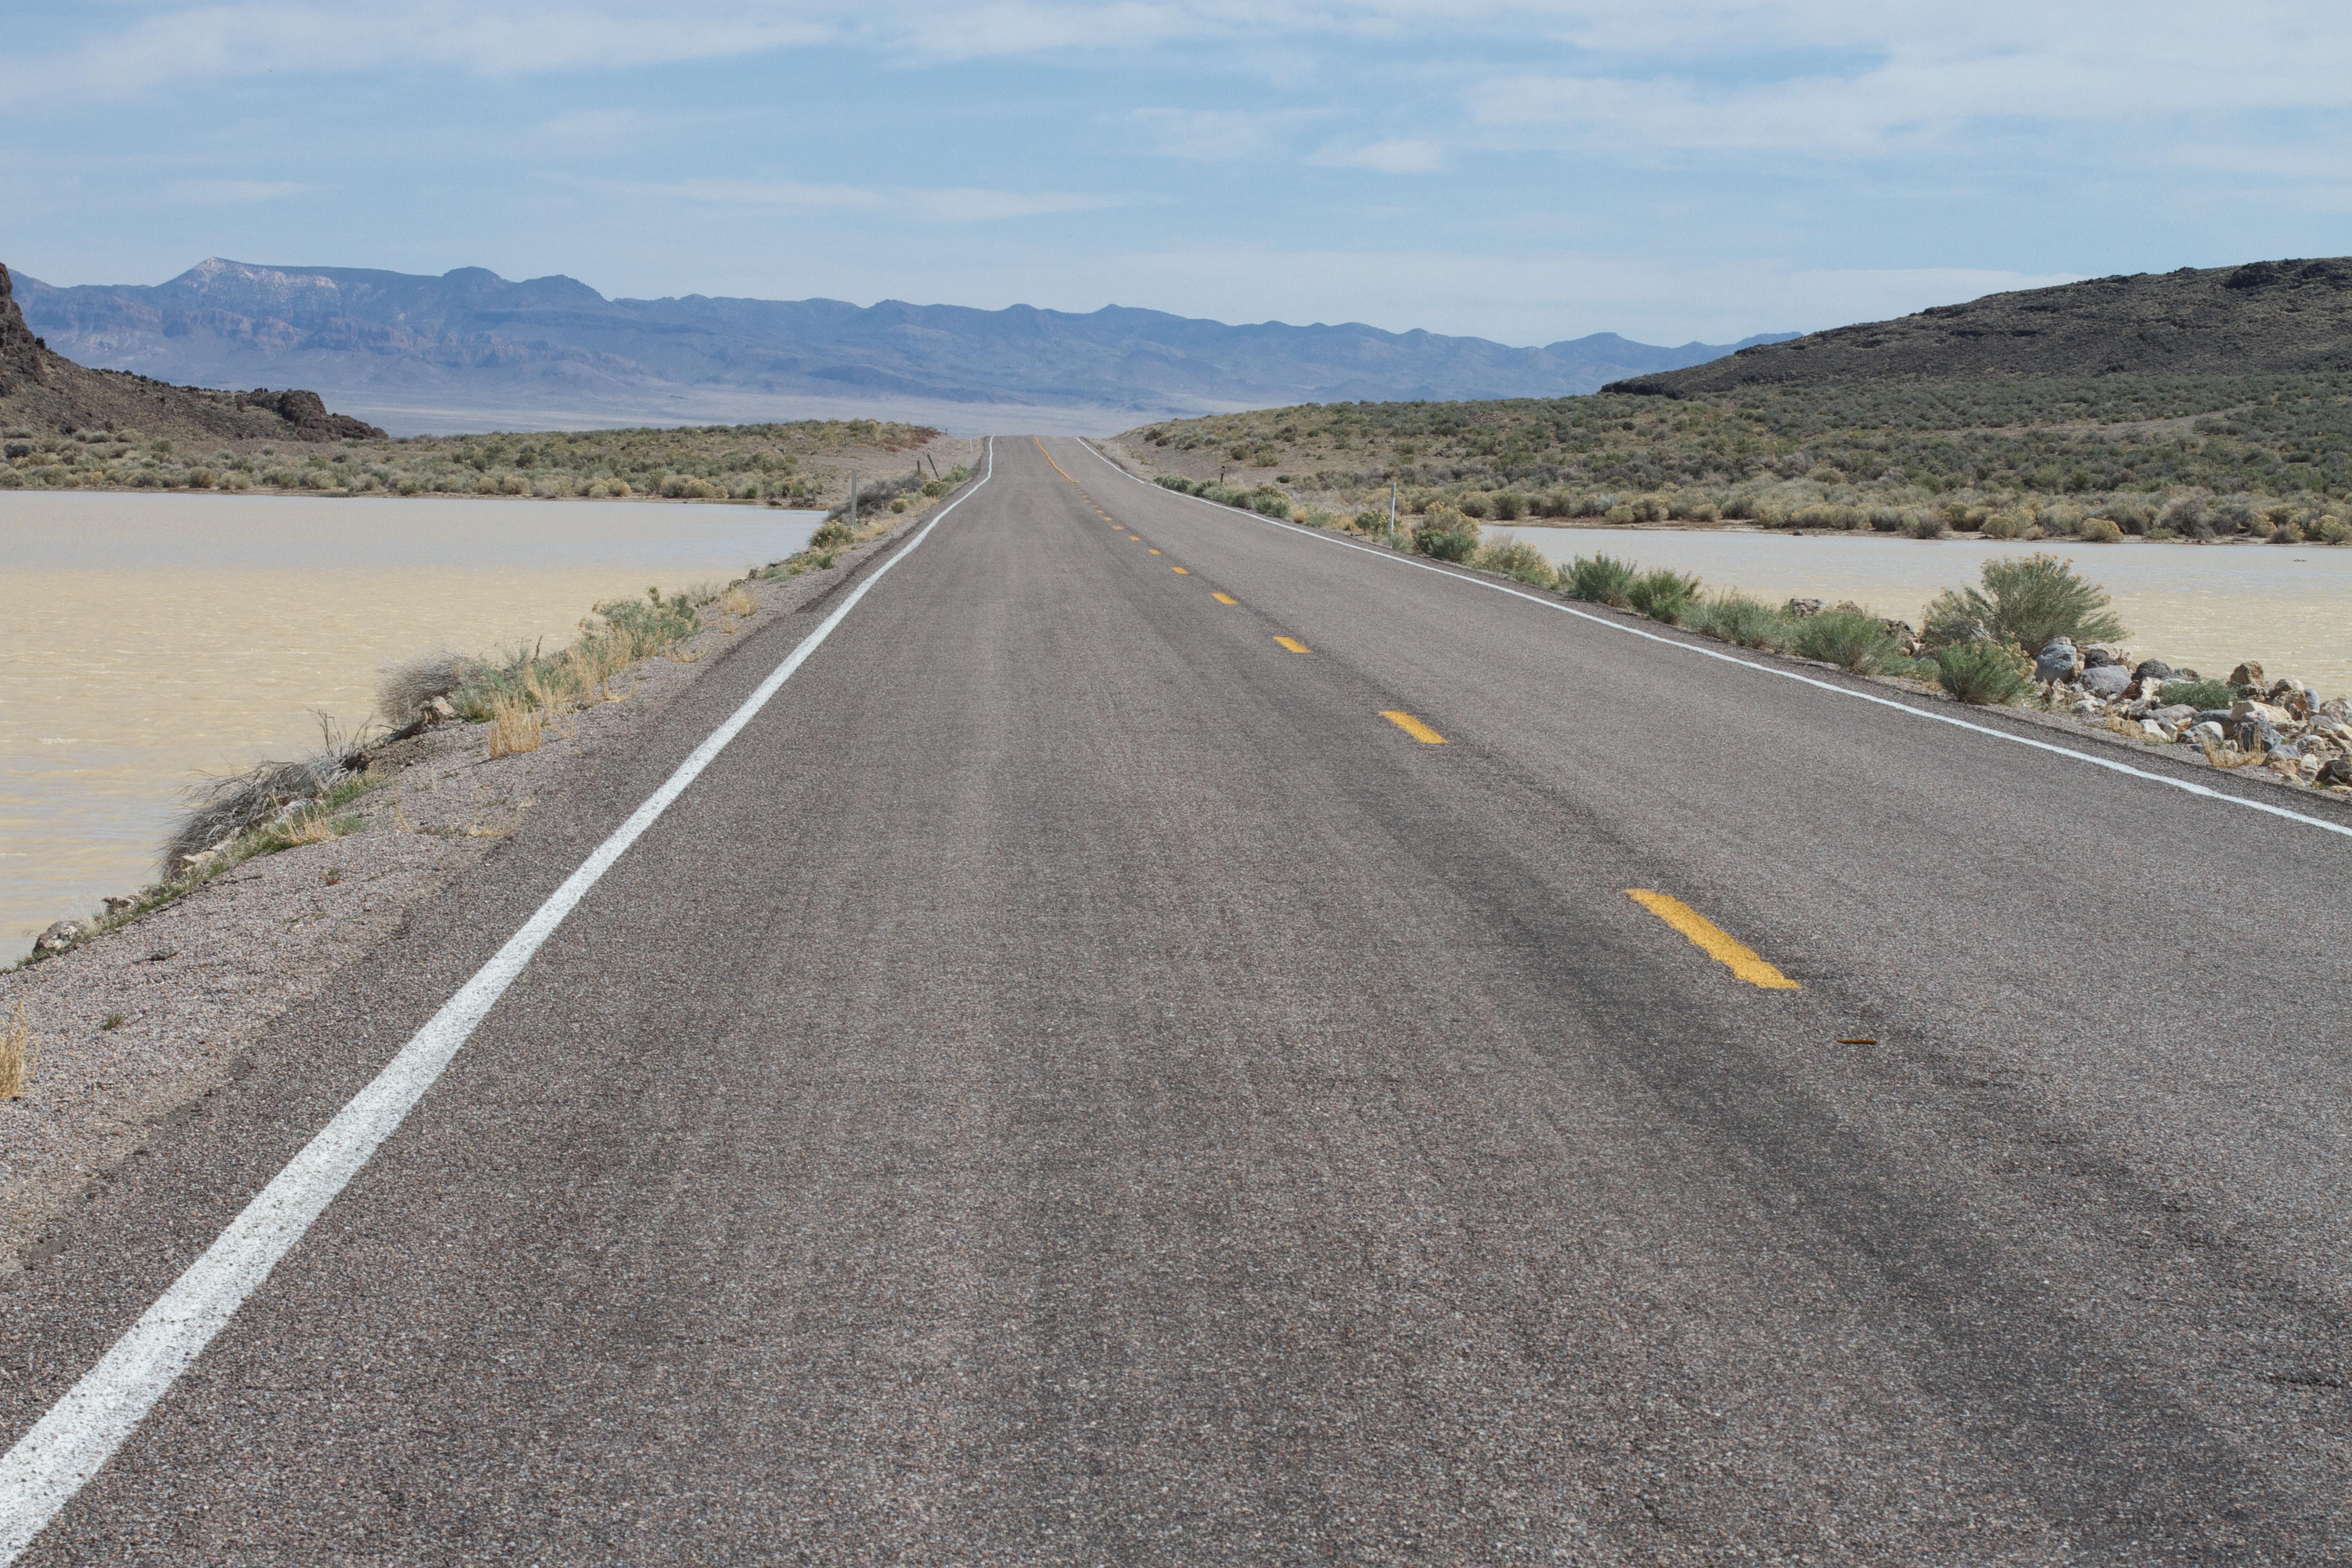 Gambar jalan raya menyetir aspal Jalan tanah jalur